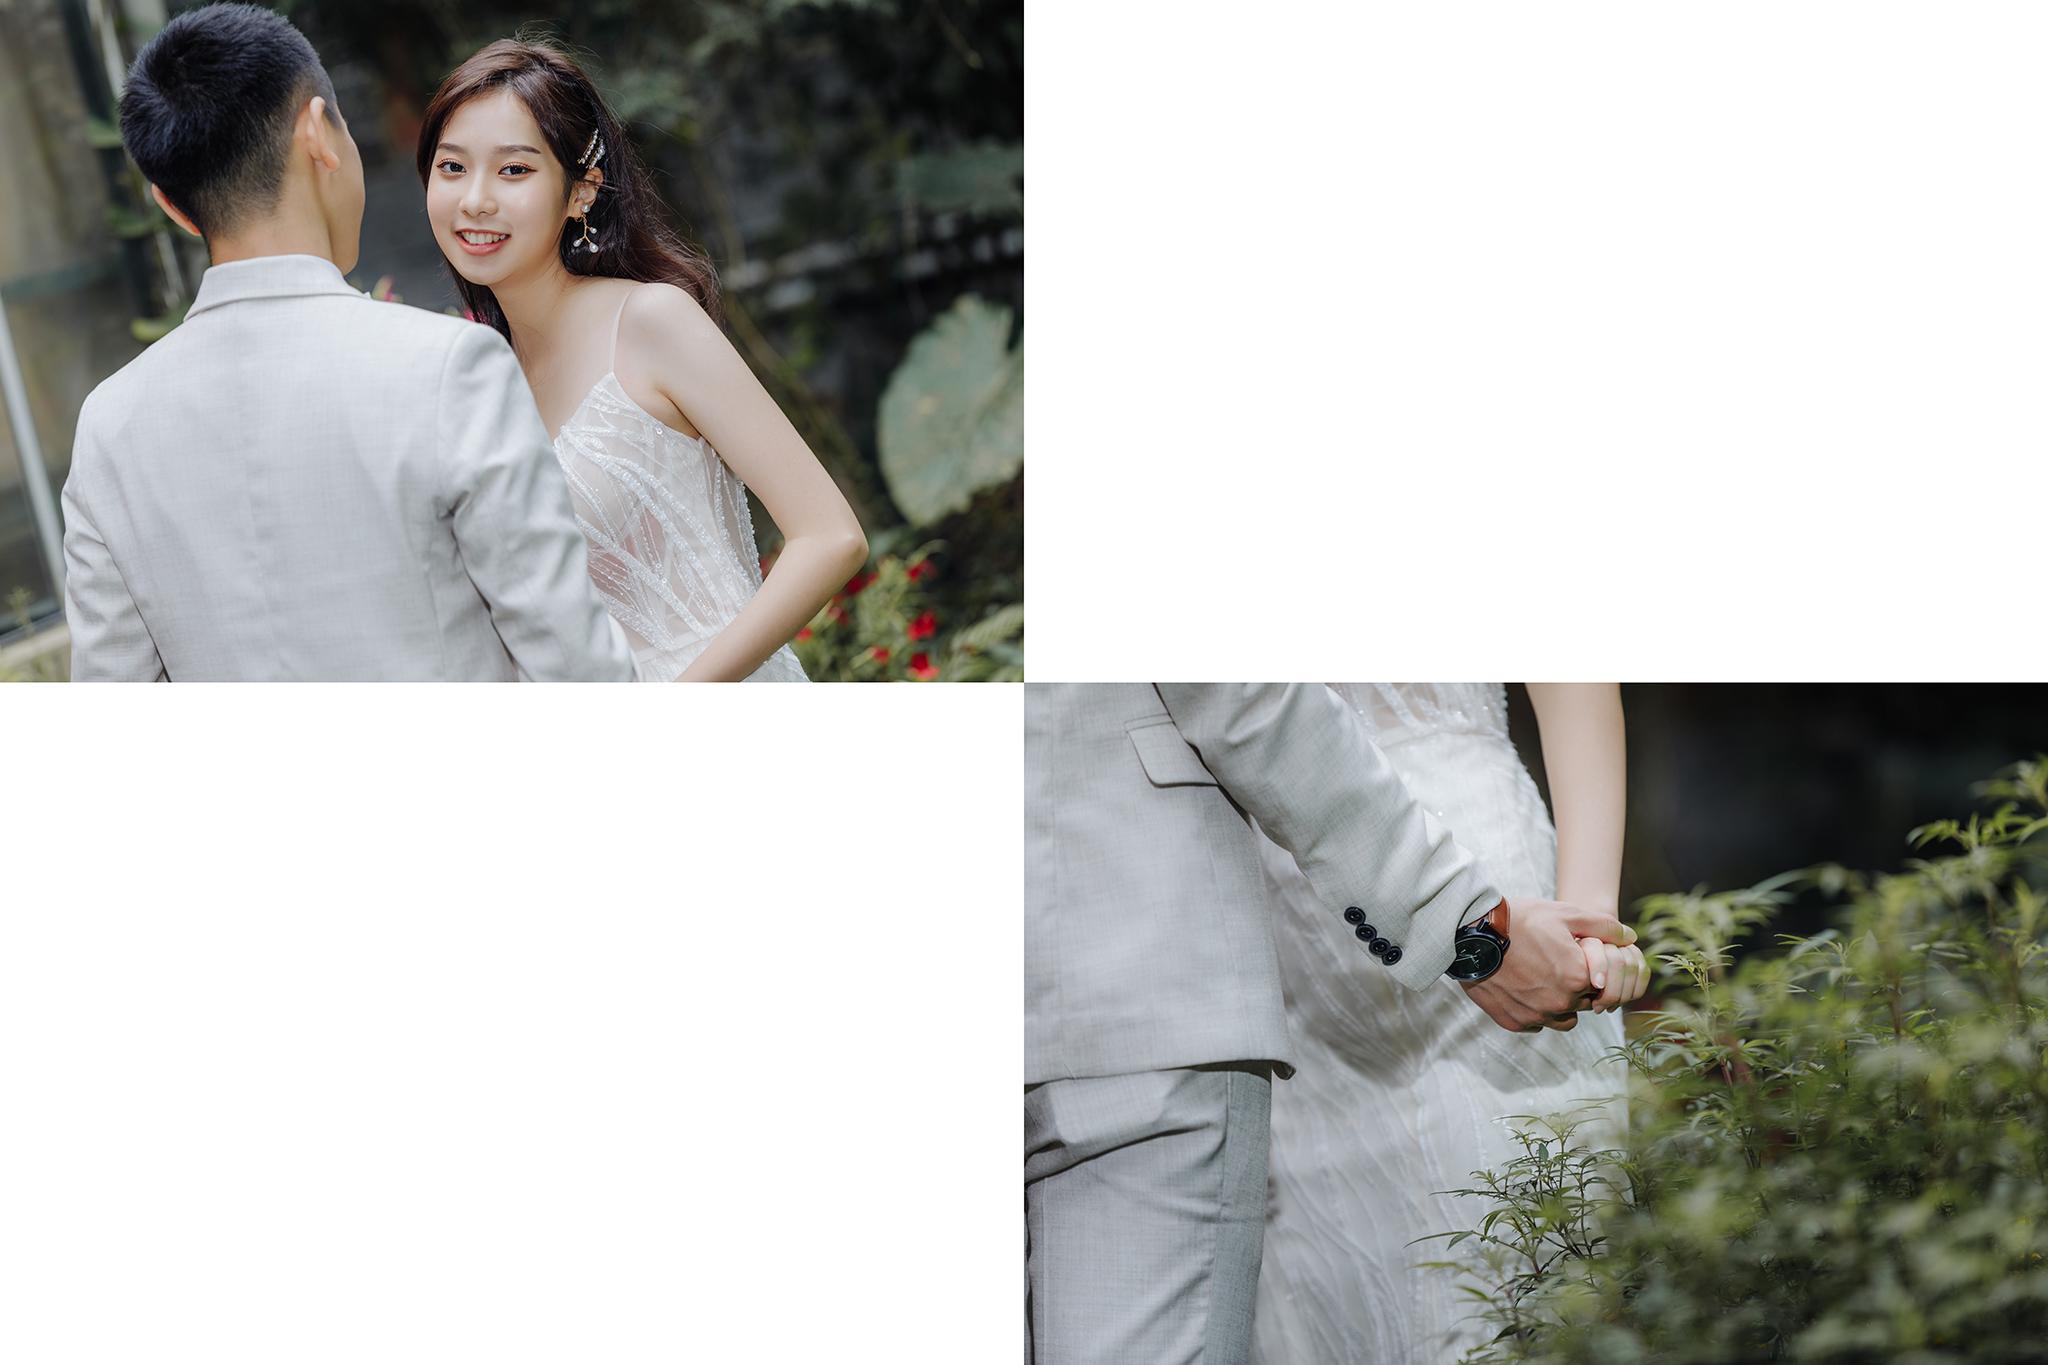 47985579927 7c2bcec973 o - 【自主婚紗】+Jared & Arina+